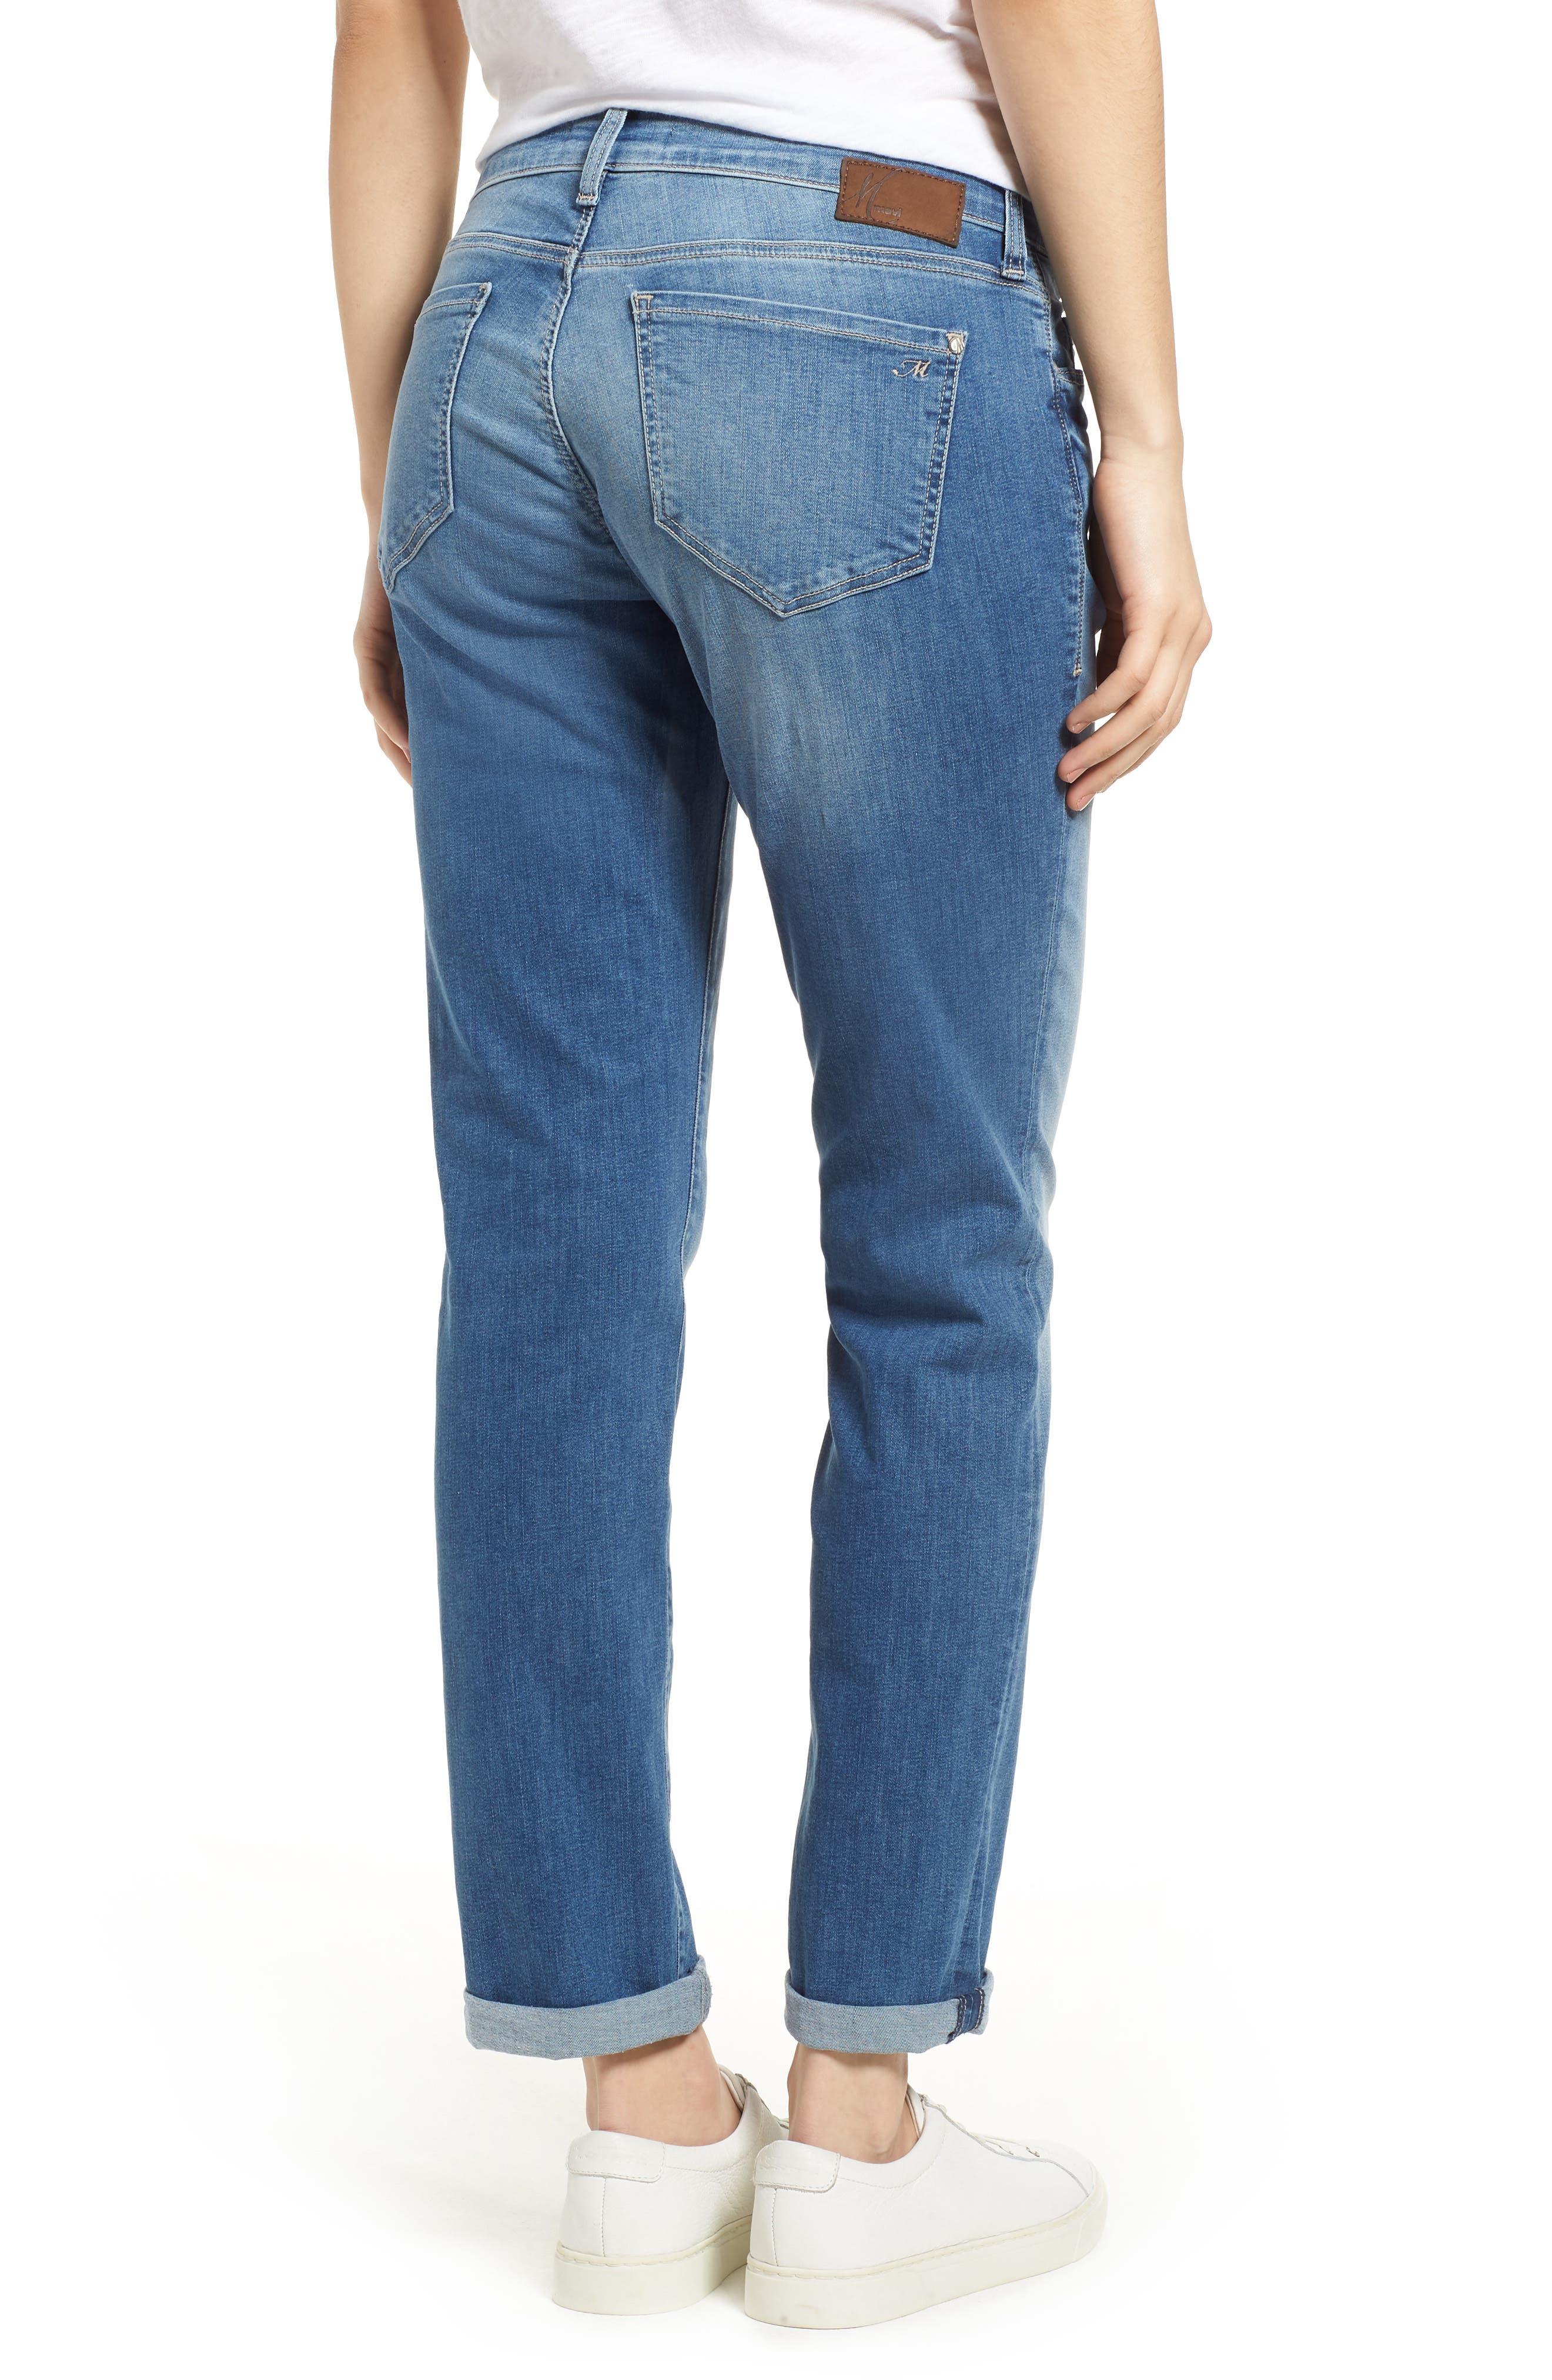 Emma Slim Boyfriend Jeans,                             Alternate thumbnail 2, color,                             INDIGO RIPPED NOLITA